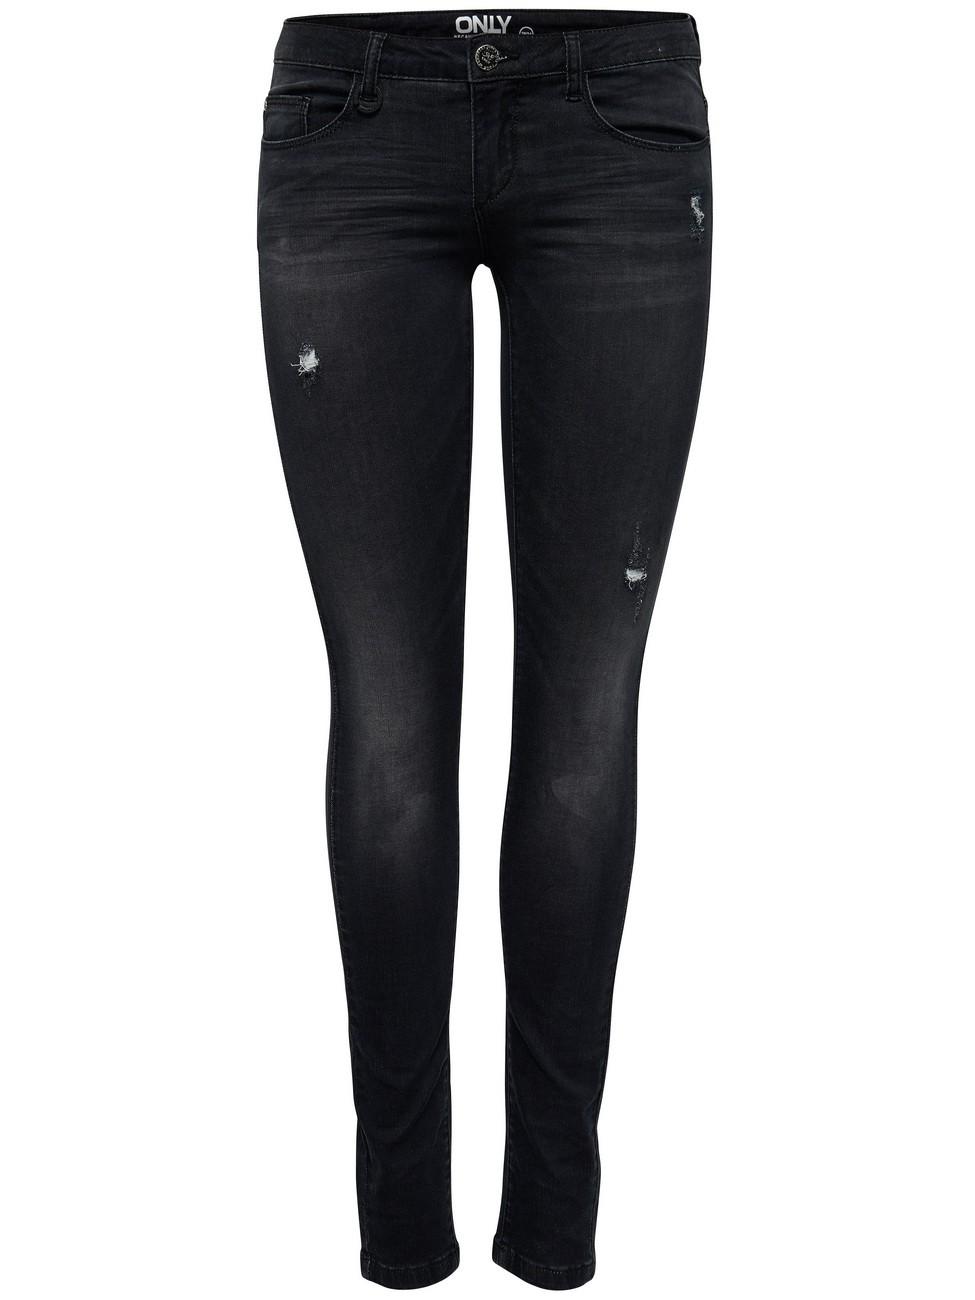 Only Damen Jeans onlCORAL - Skinny Fit - Black